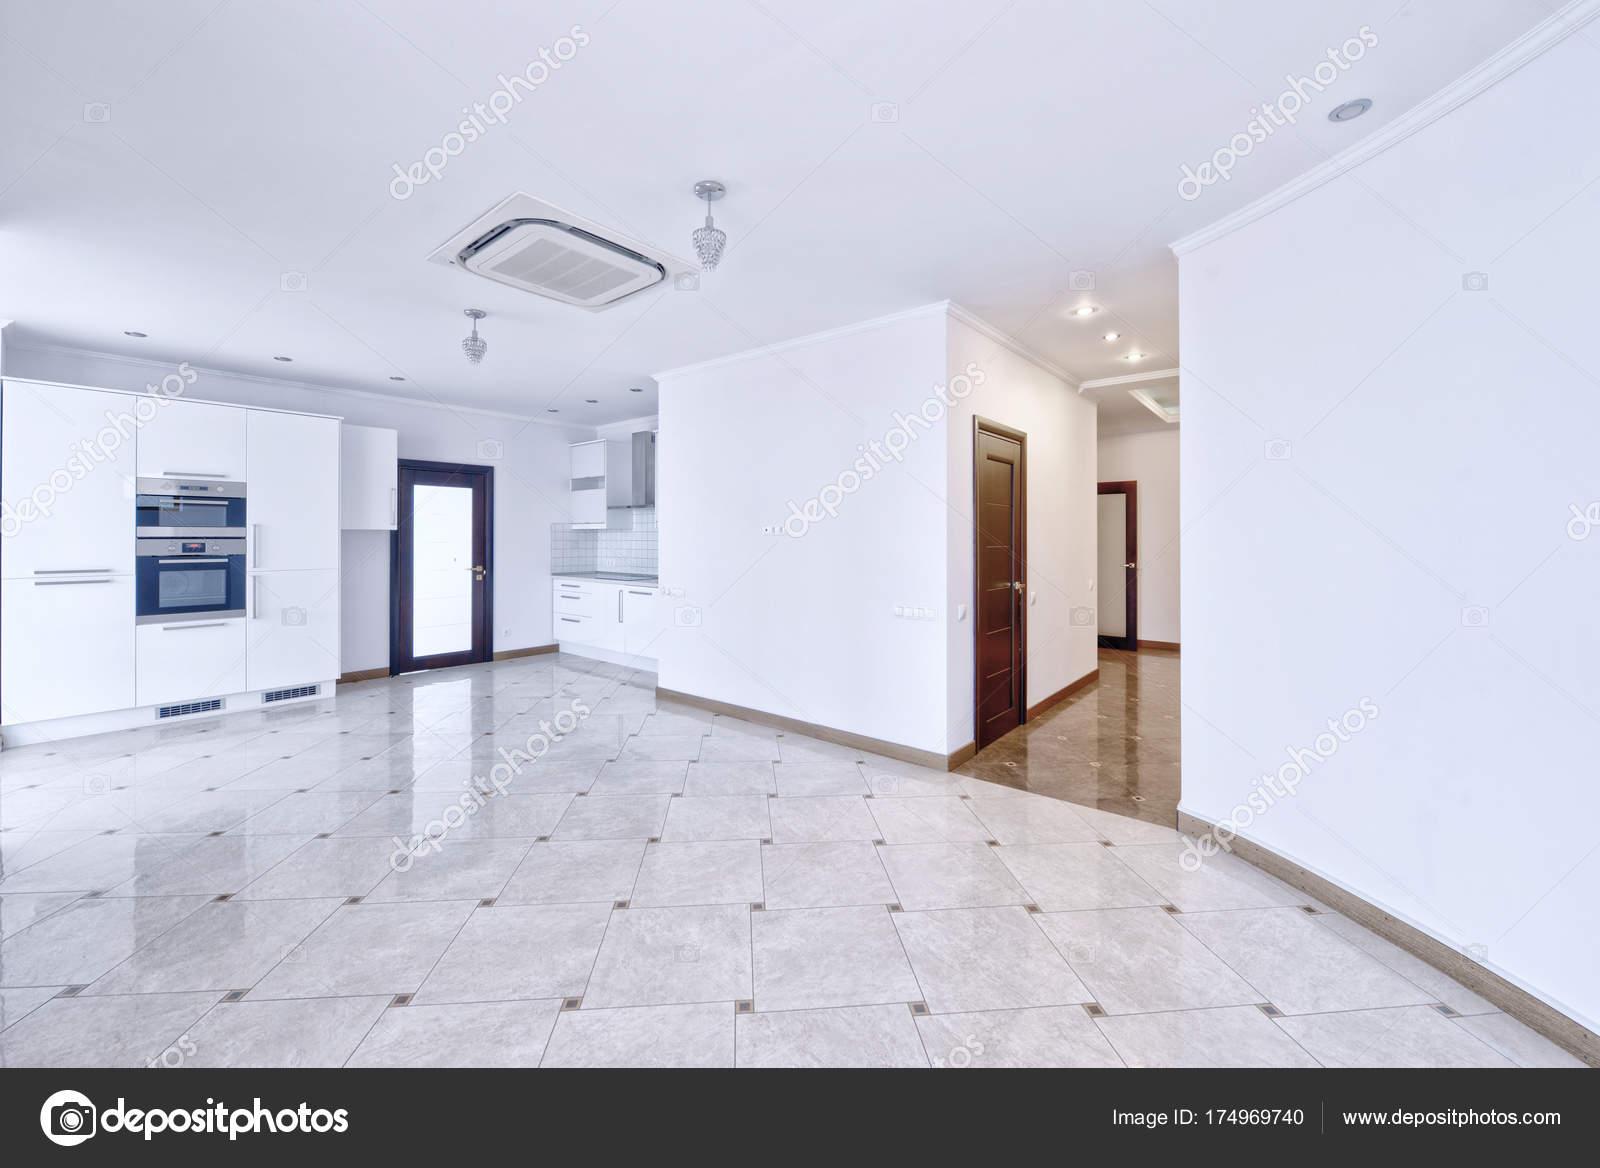 Moderne Witte Keukens : Moderne witte keuken een ruim appartement u2014 stockfoto